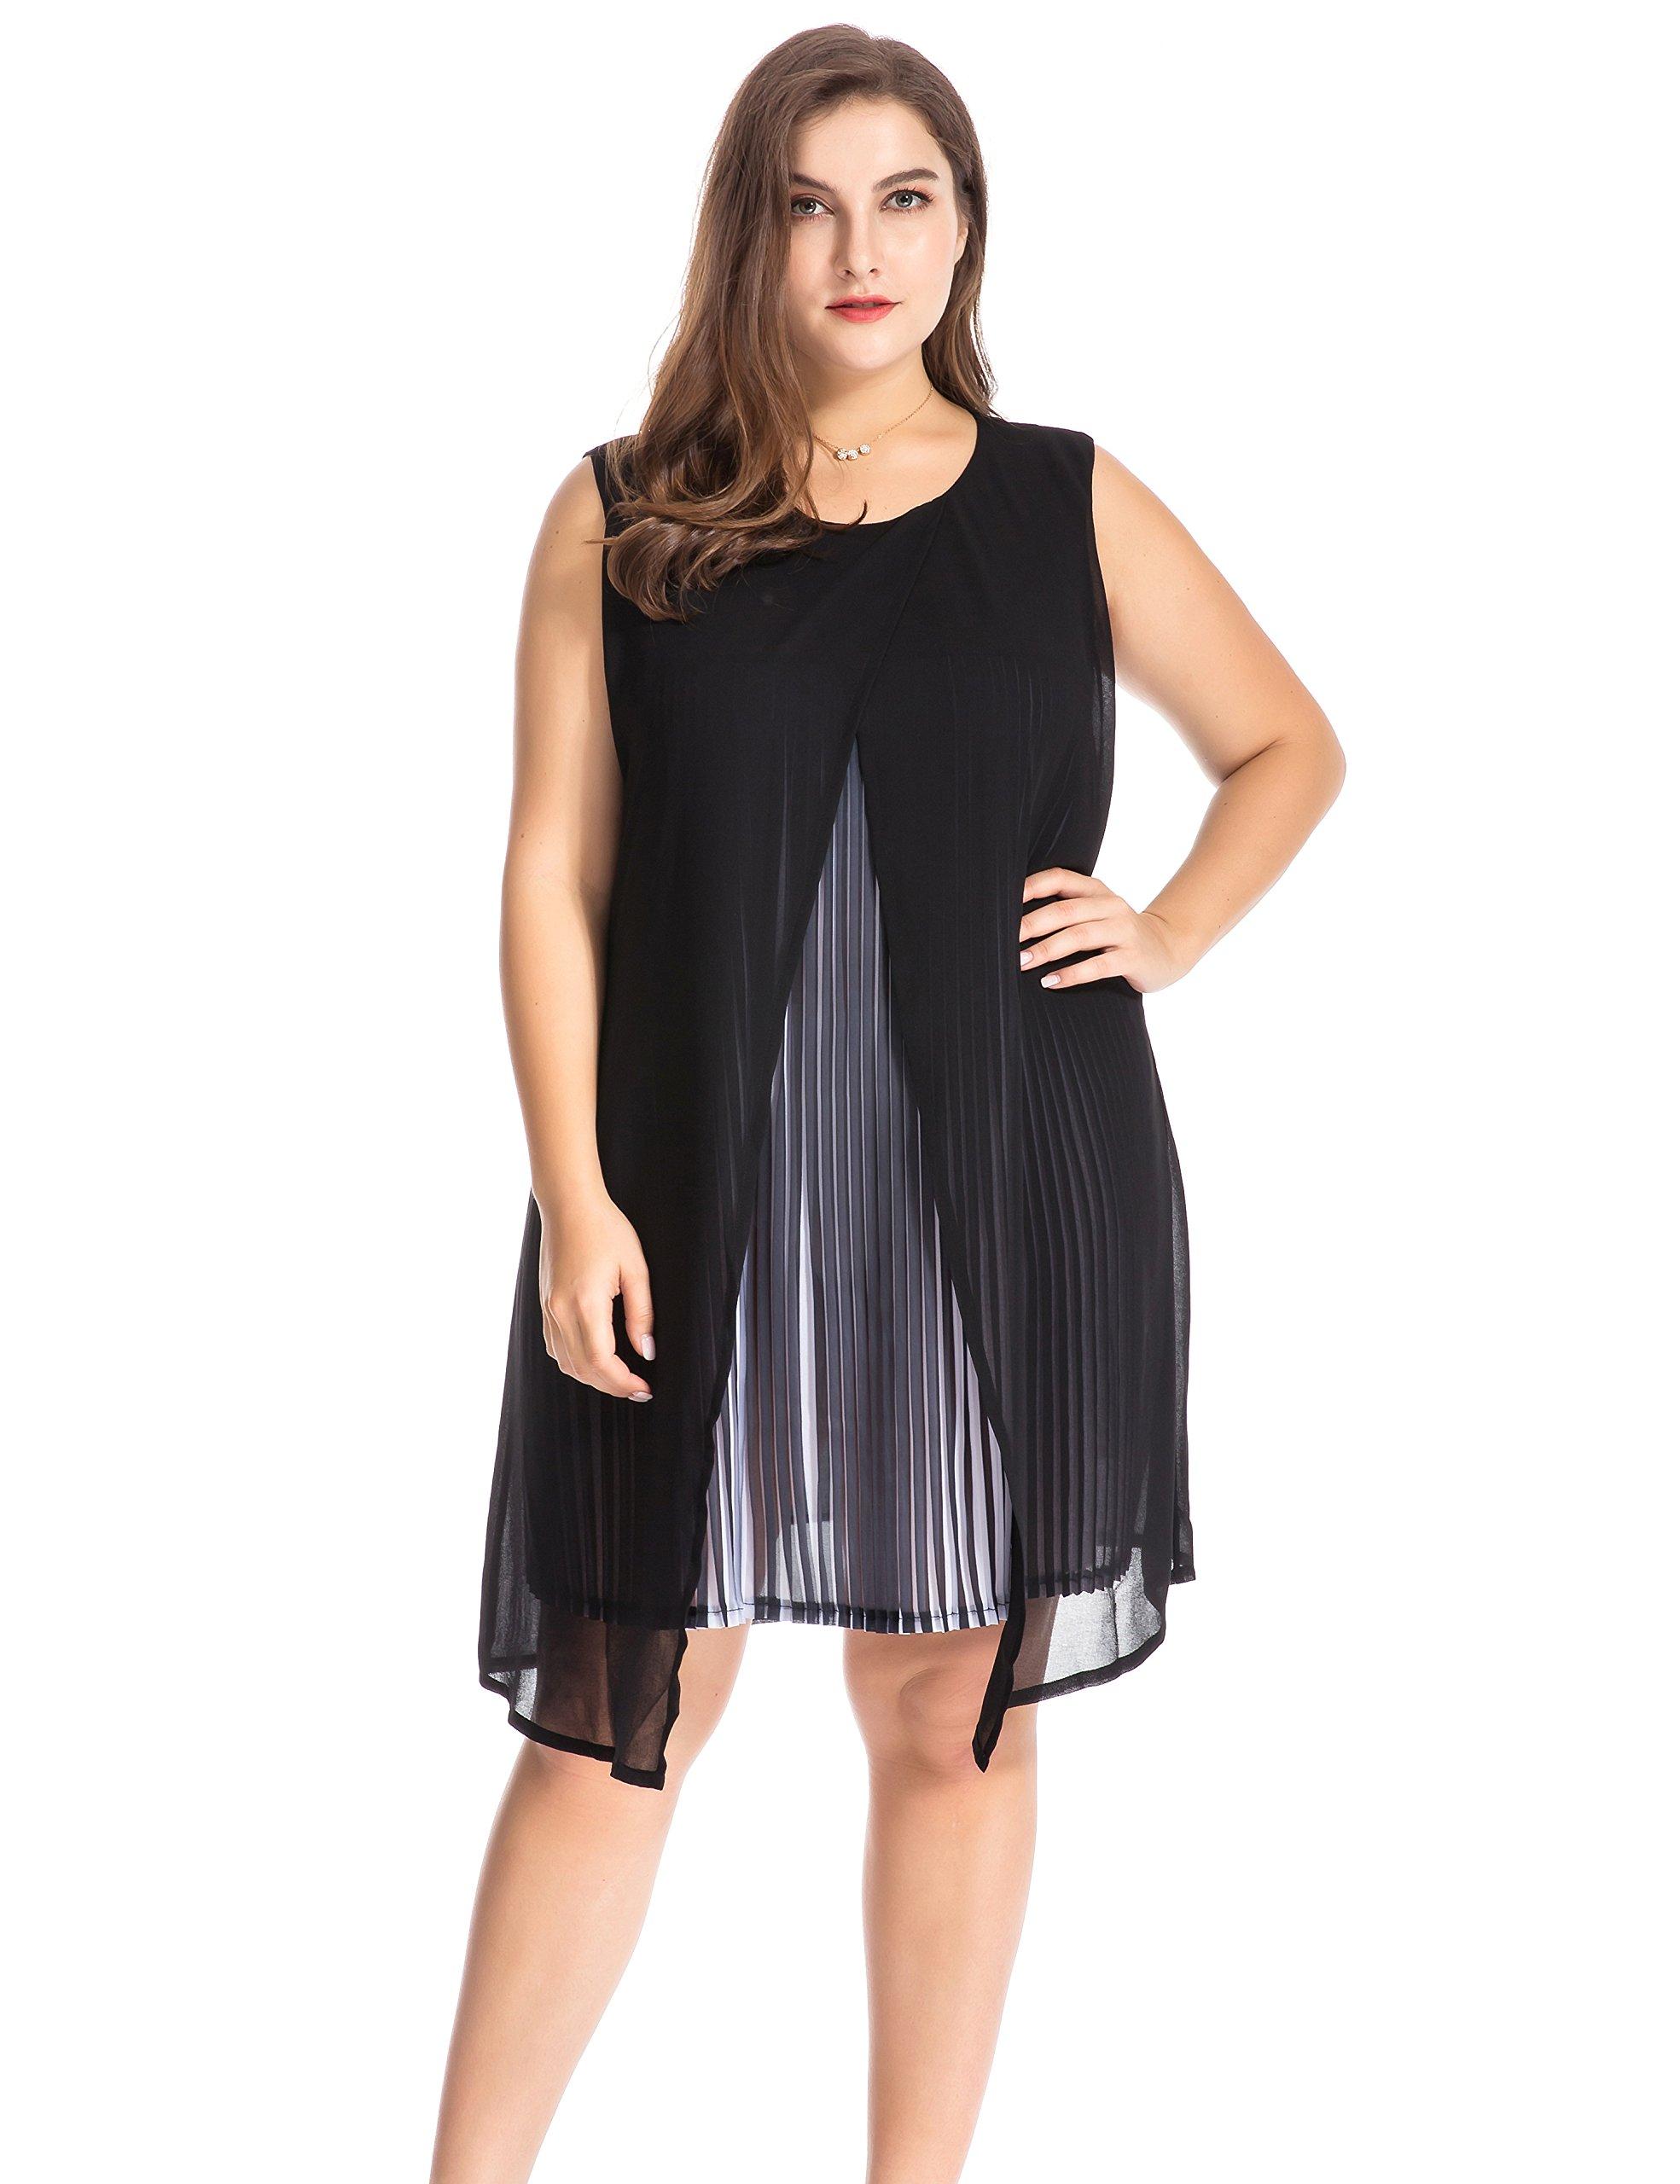 Chicwe Women's Plus Size Chiffon Multi Layers Split Pleat Tunic Dress - Casual Party and Work Dress 3X